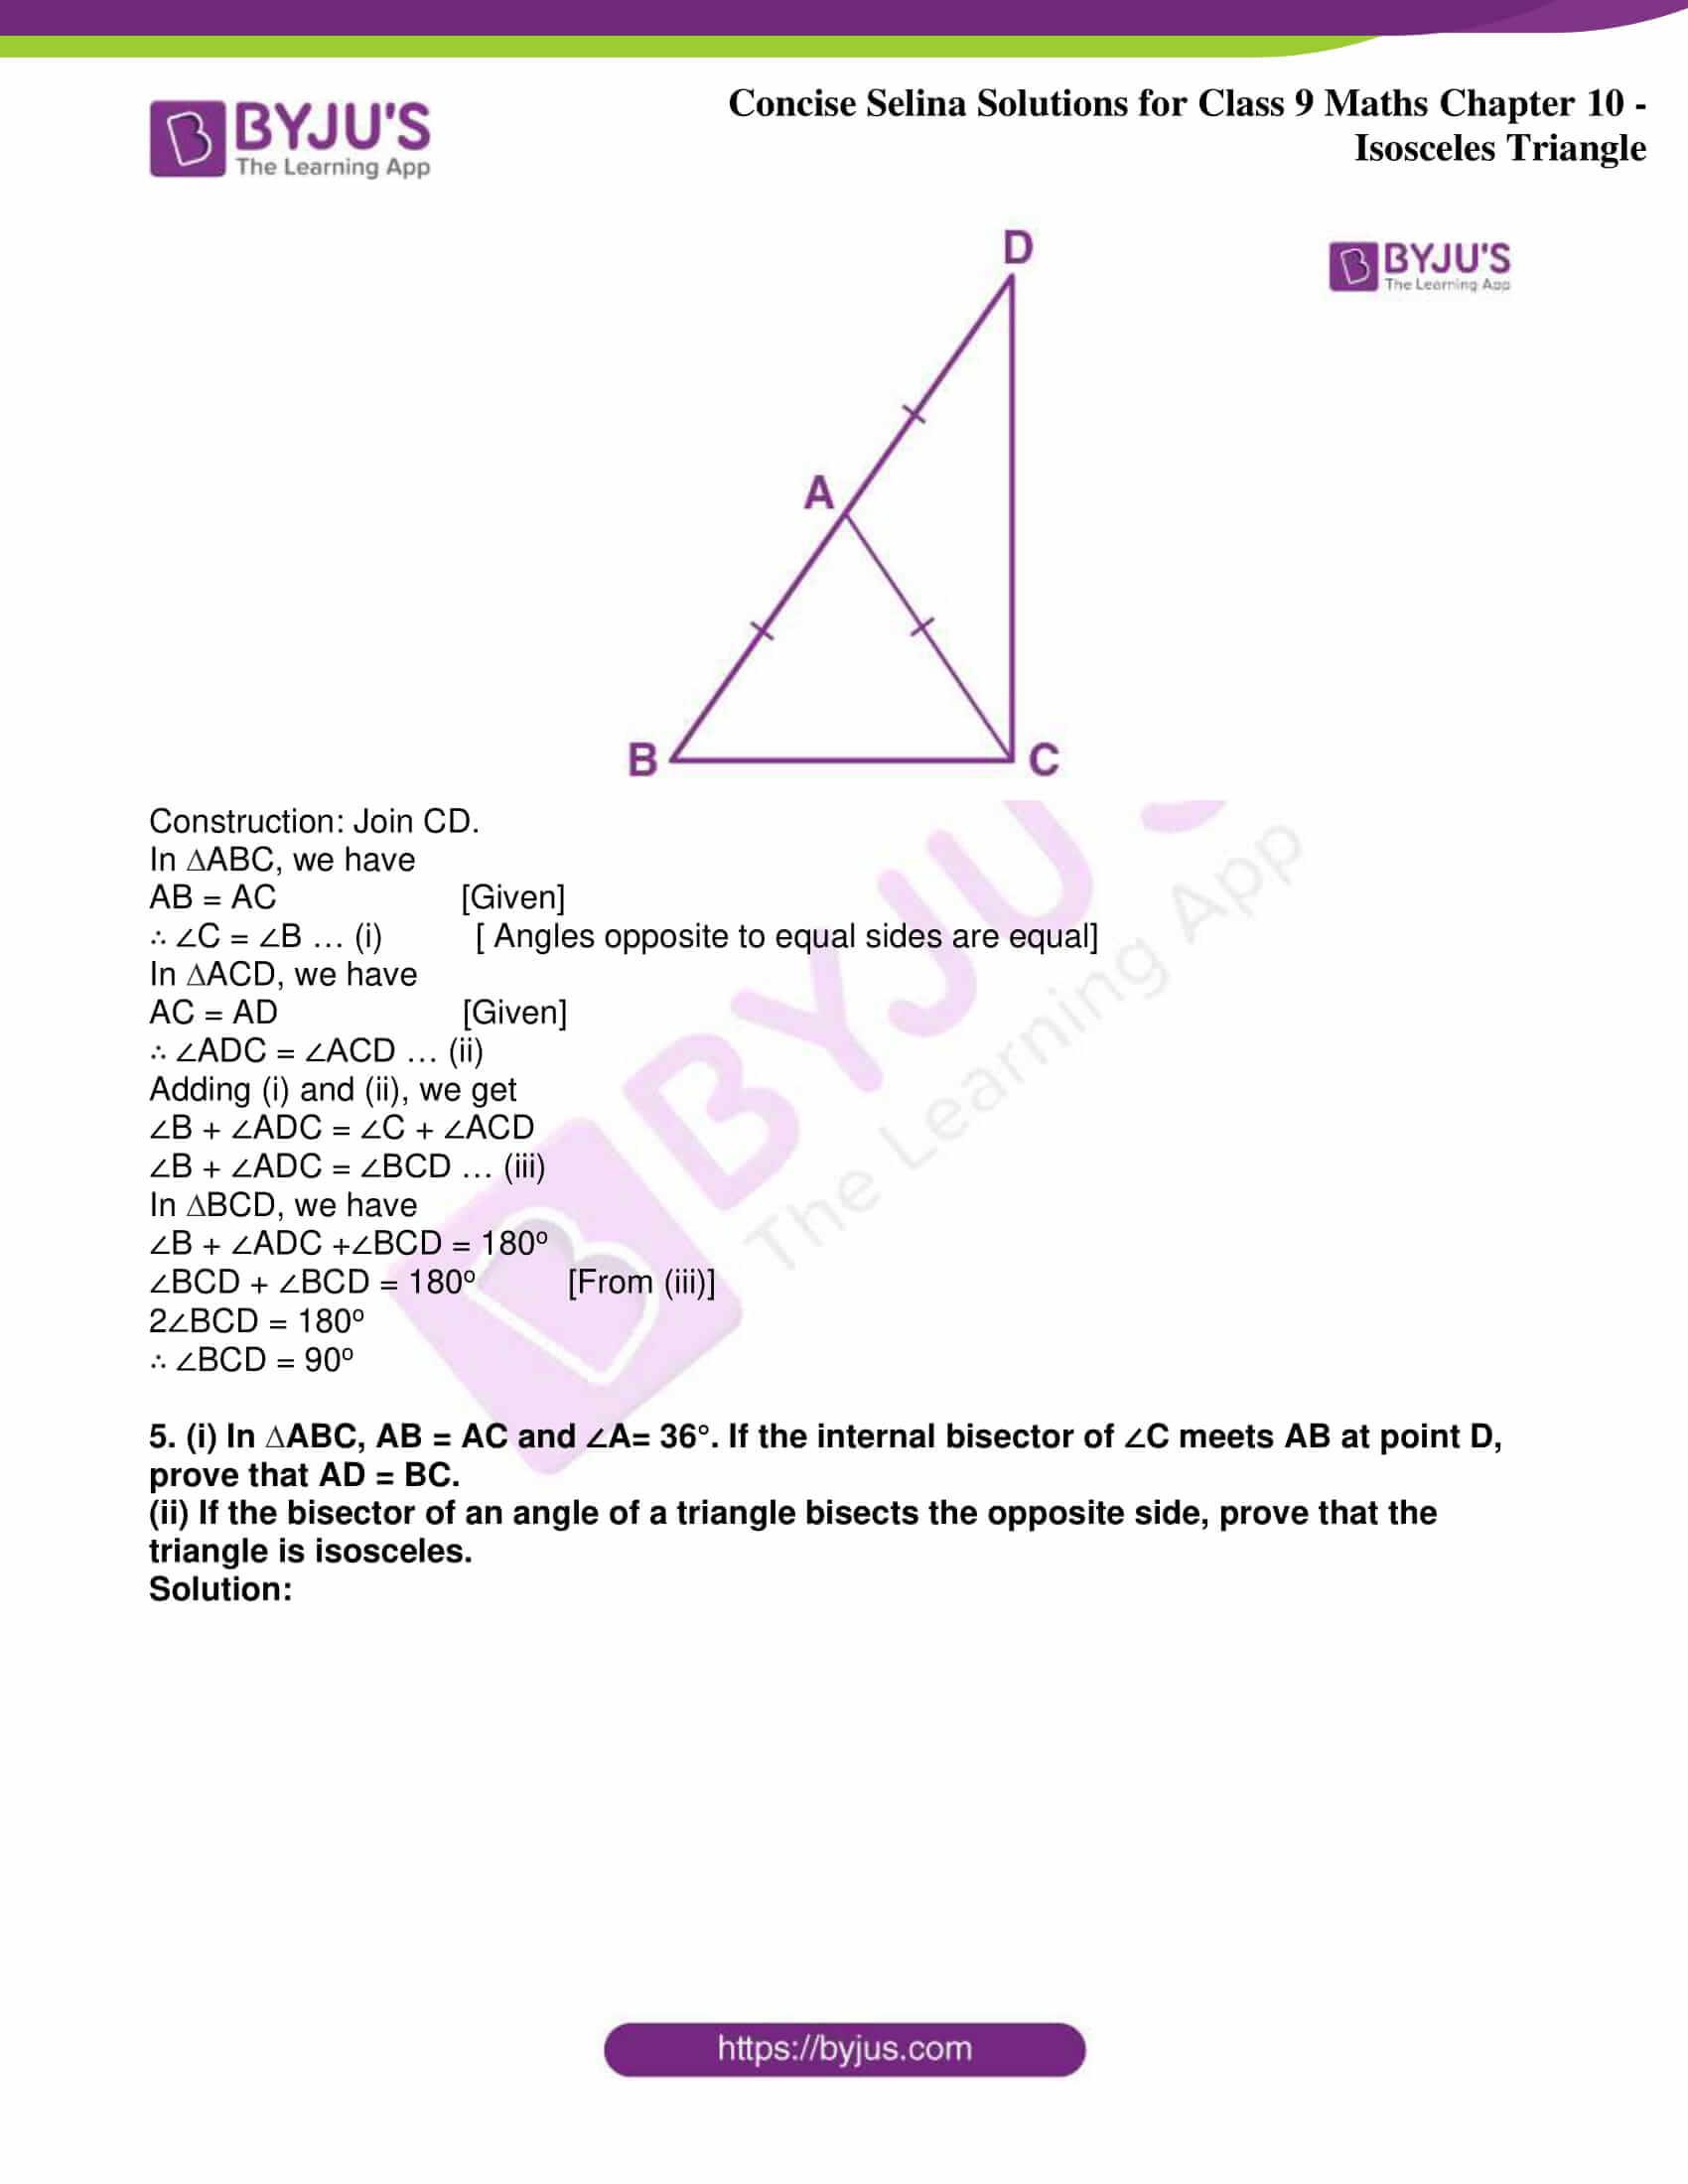 icse class 9 jun8 maths selina solutions chapter 10 isosceles triangles 23